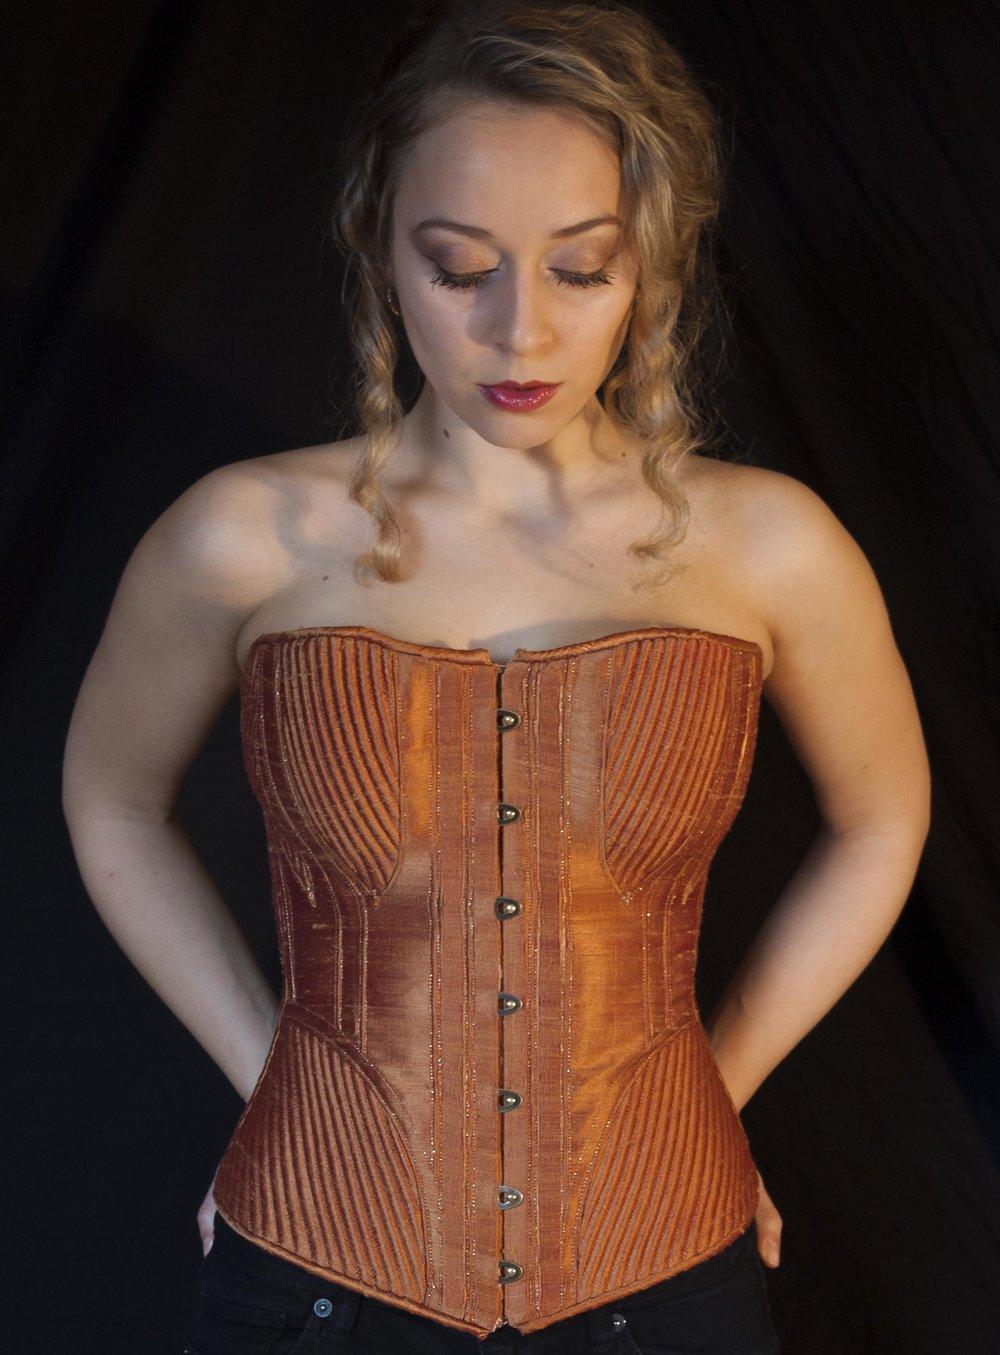 copper-silk-corset-front.jpg